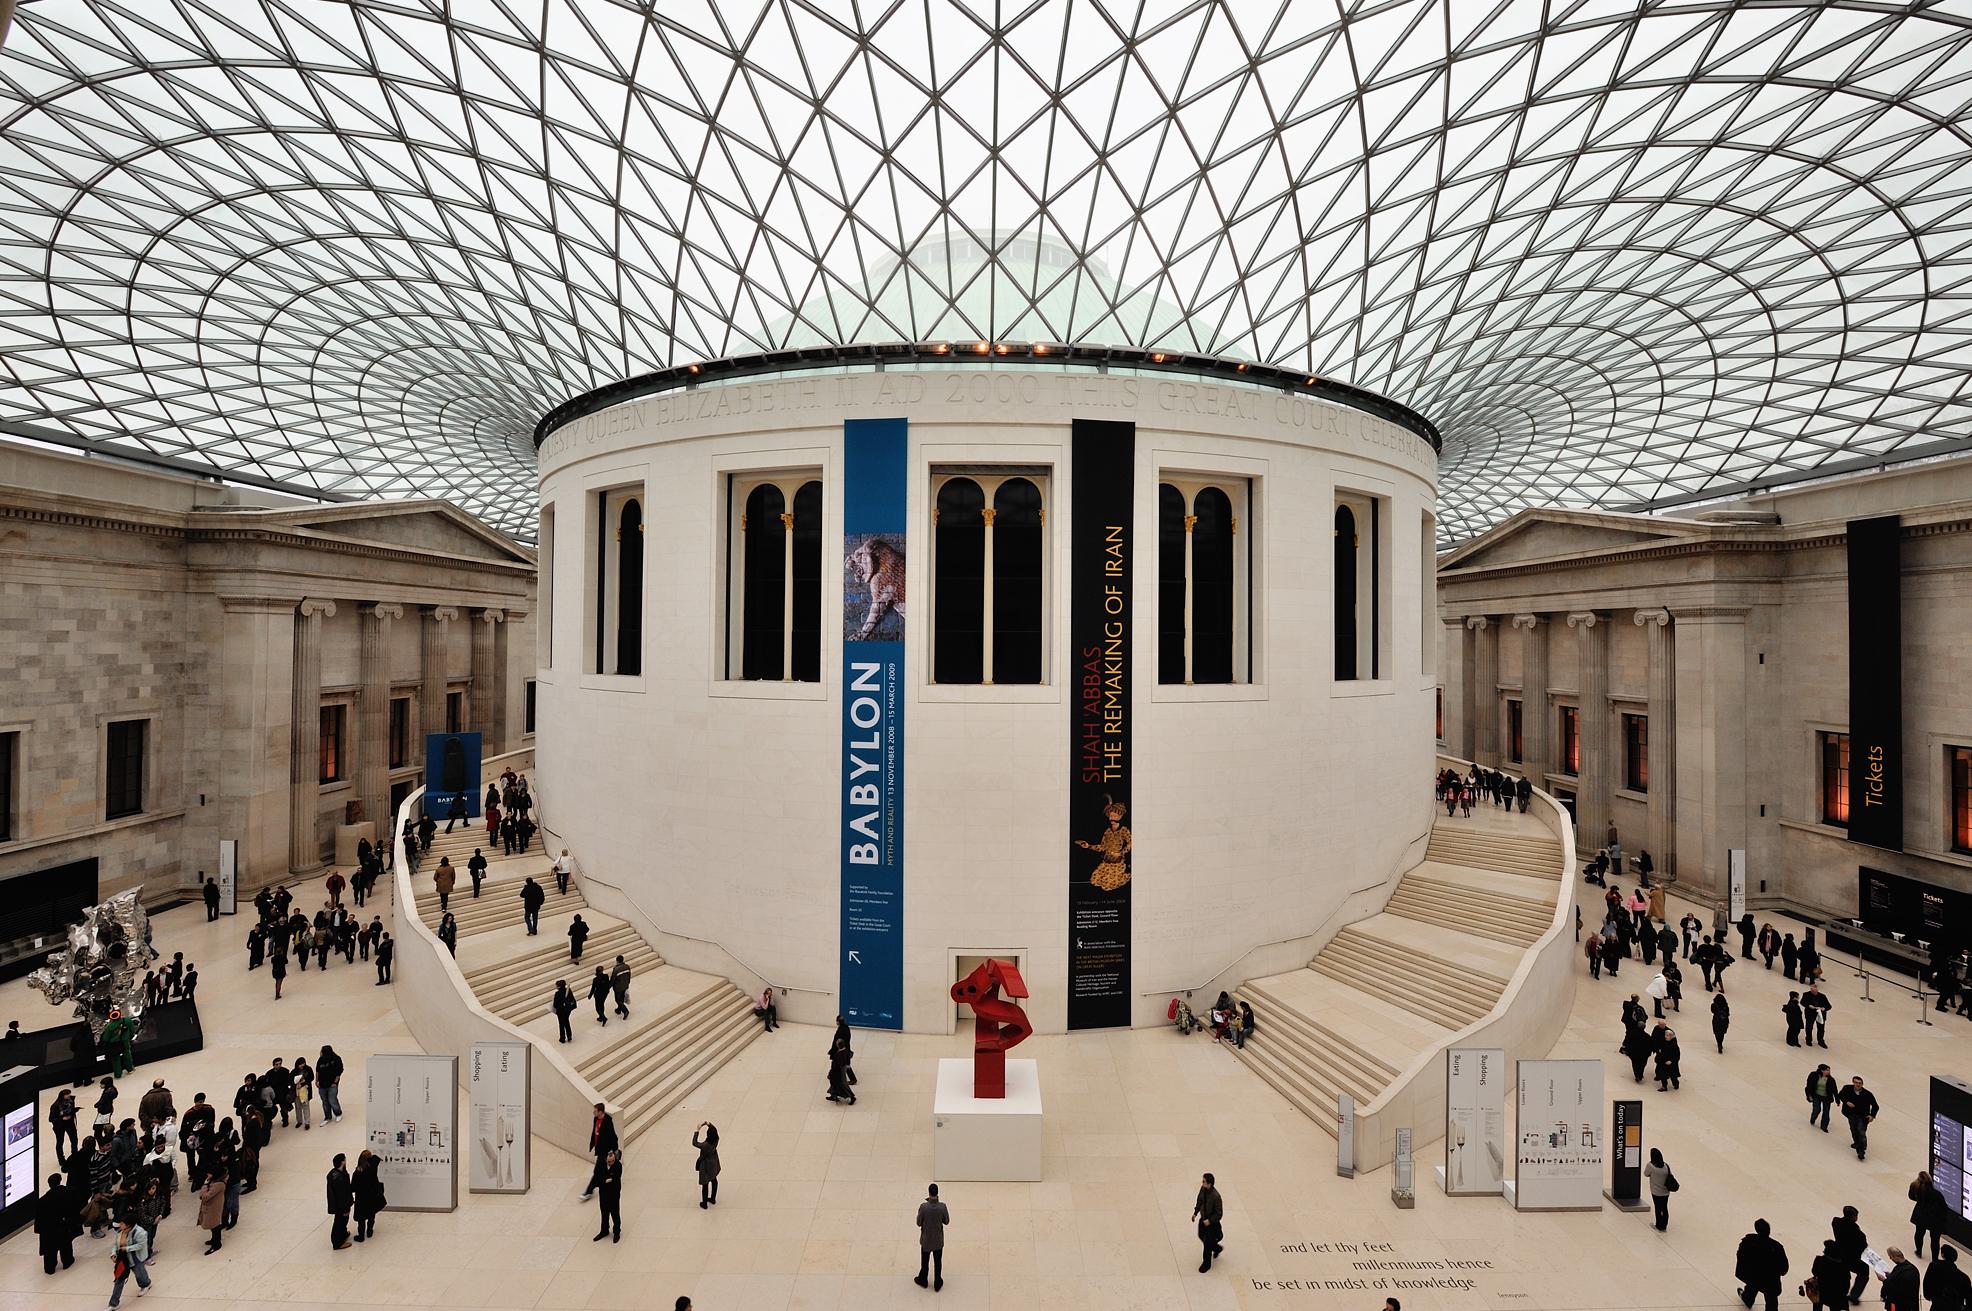 Domul din British Museum, Londra